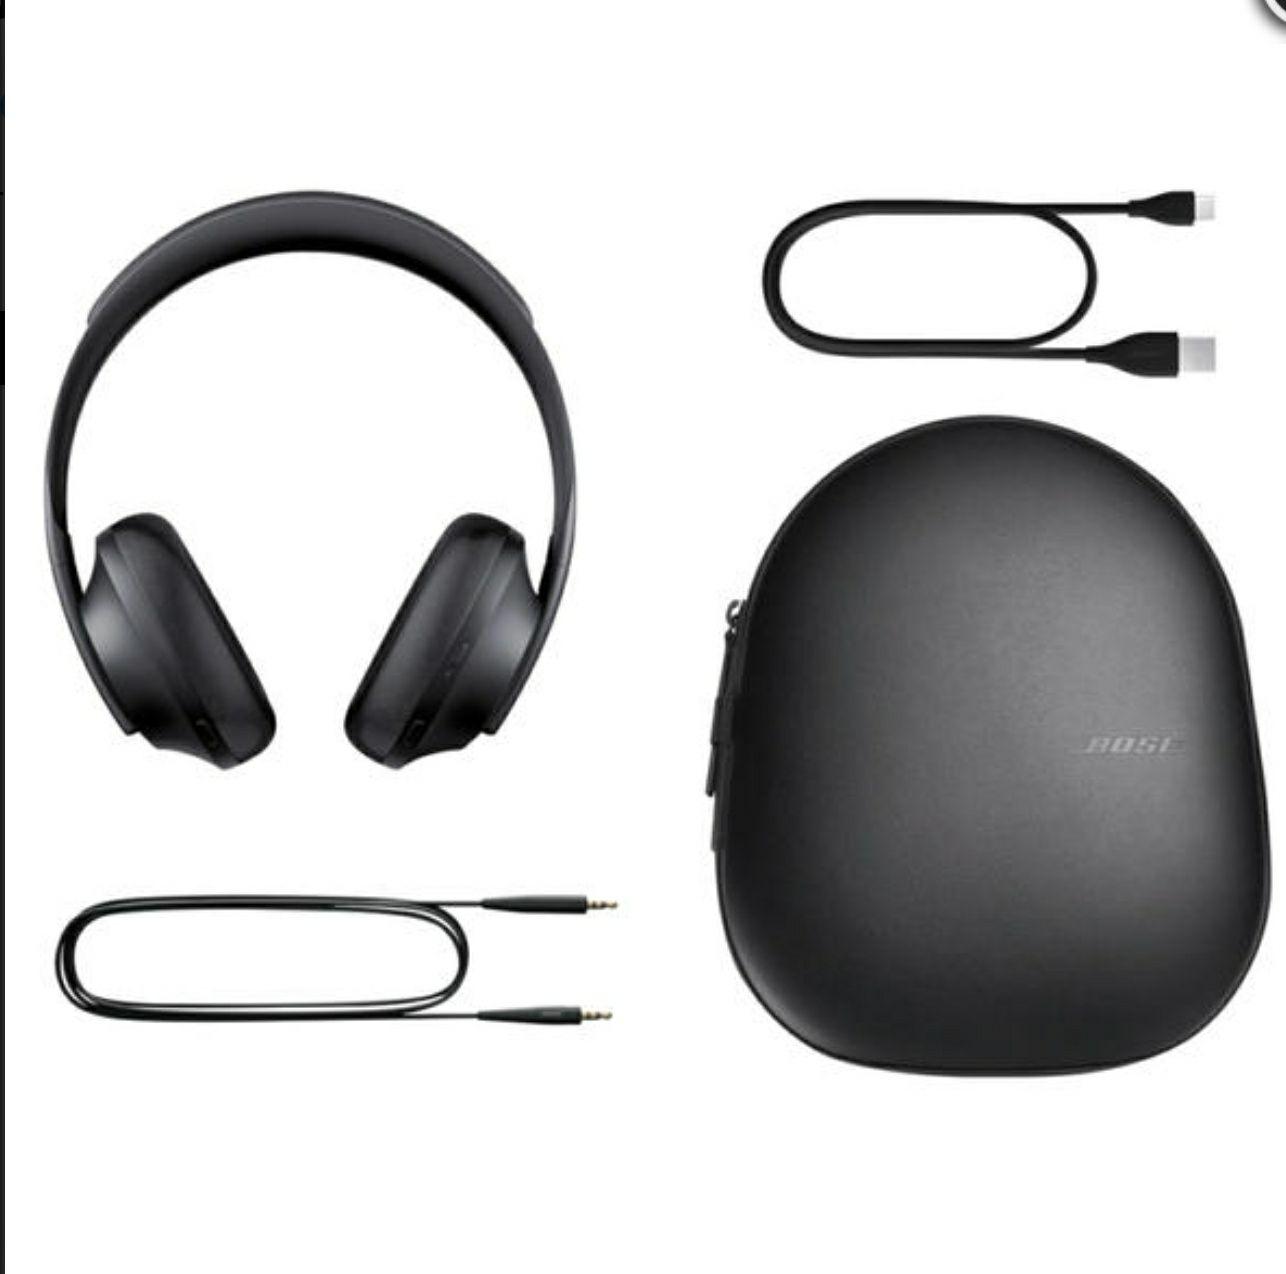 Casque Bluetooth BoseHeadphones 700 Black (Frontaliers Suisse)